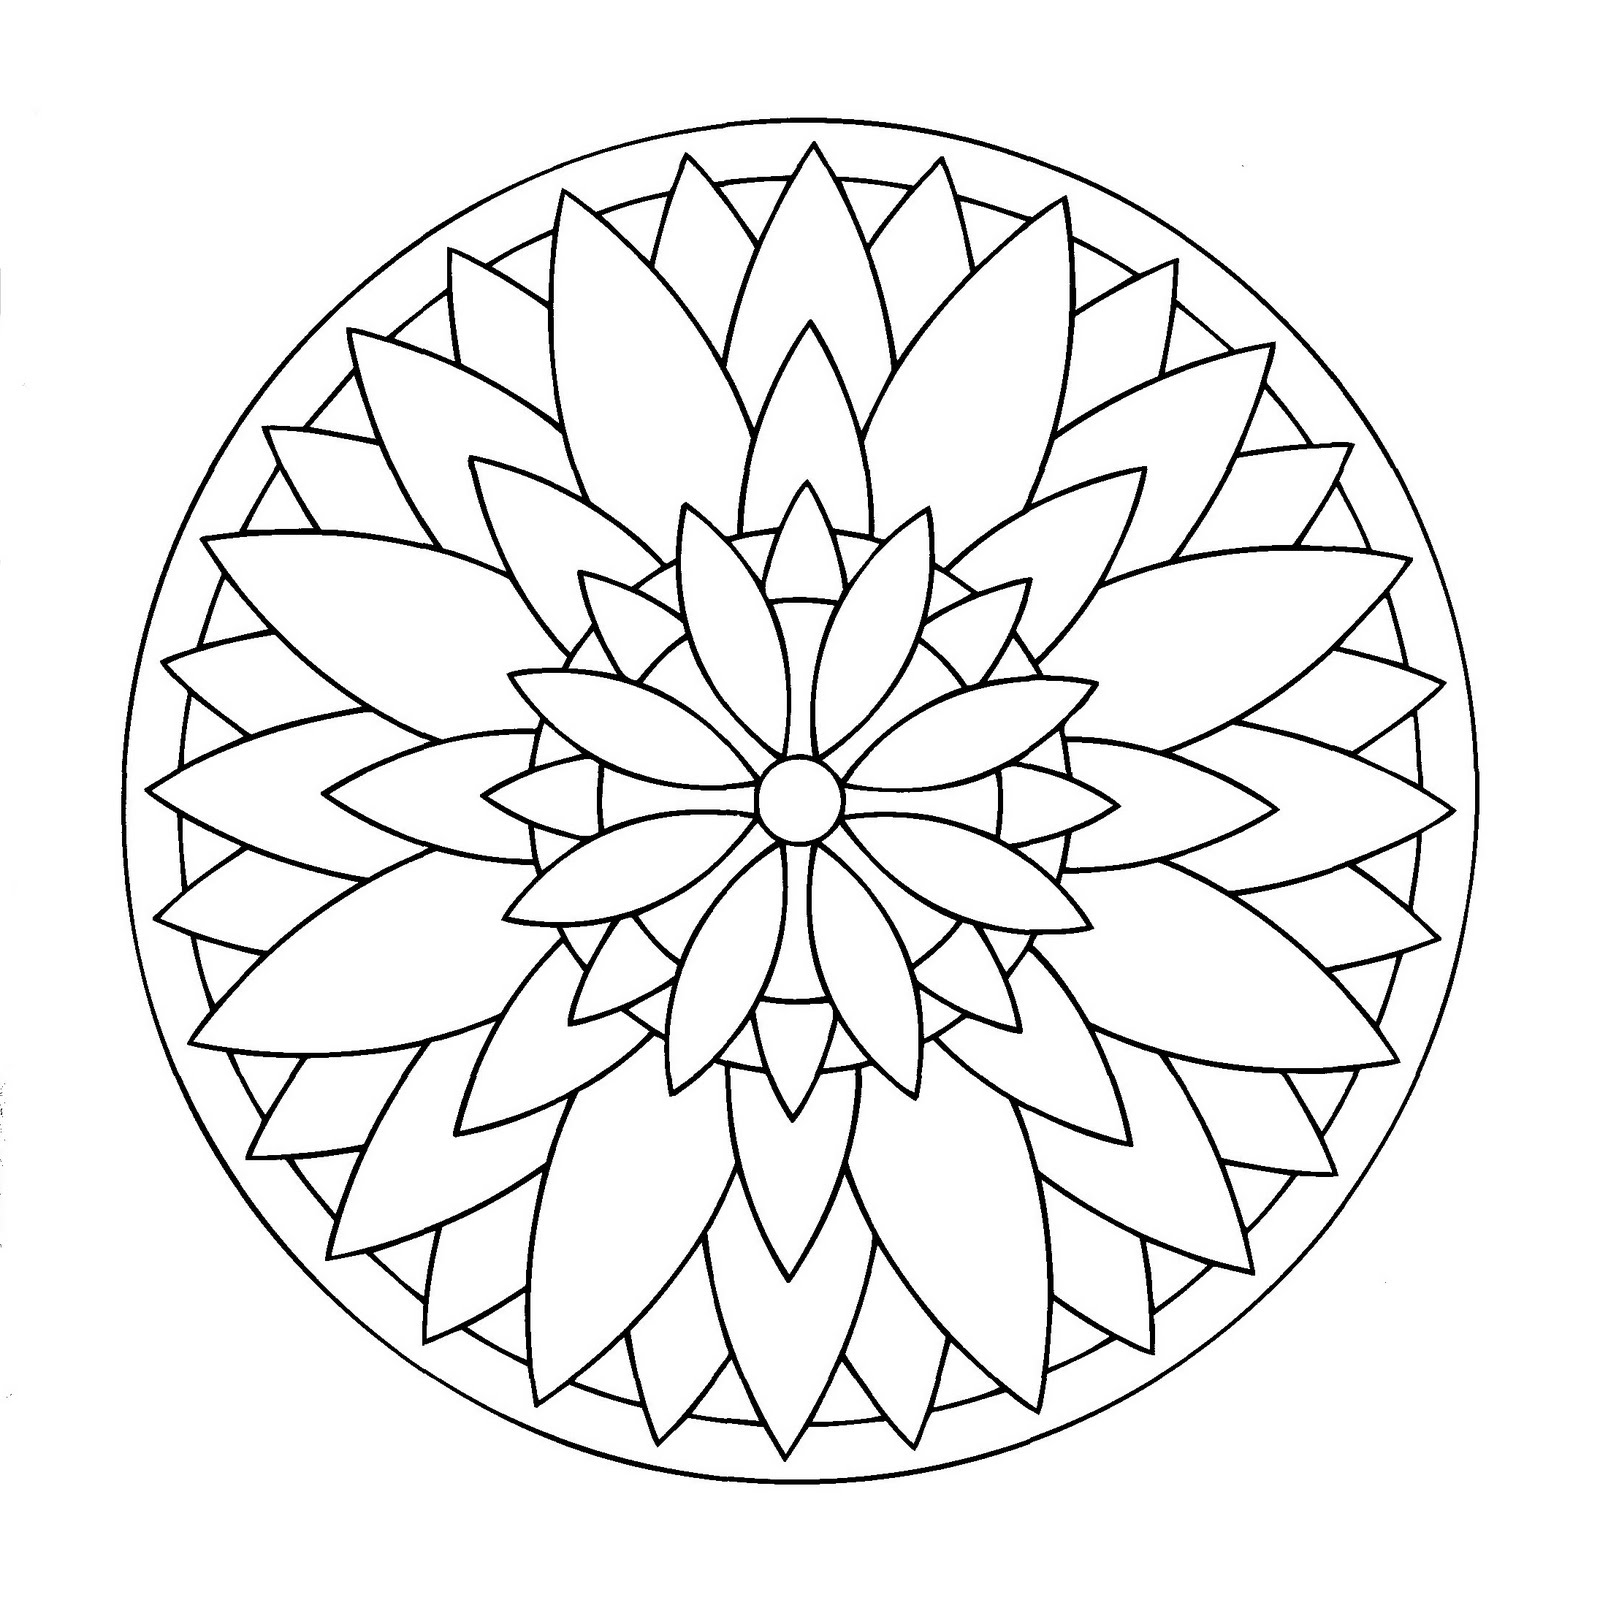 Imagenes De Mandala Para Imprimir